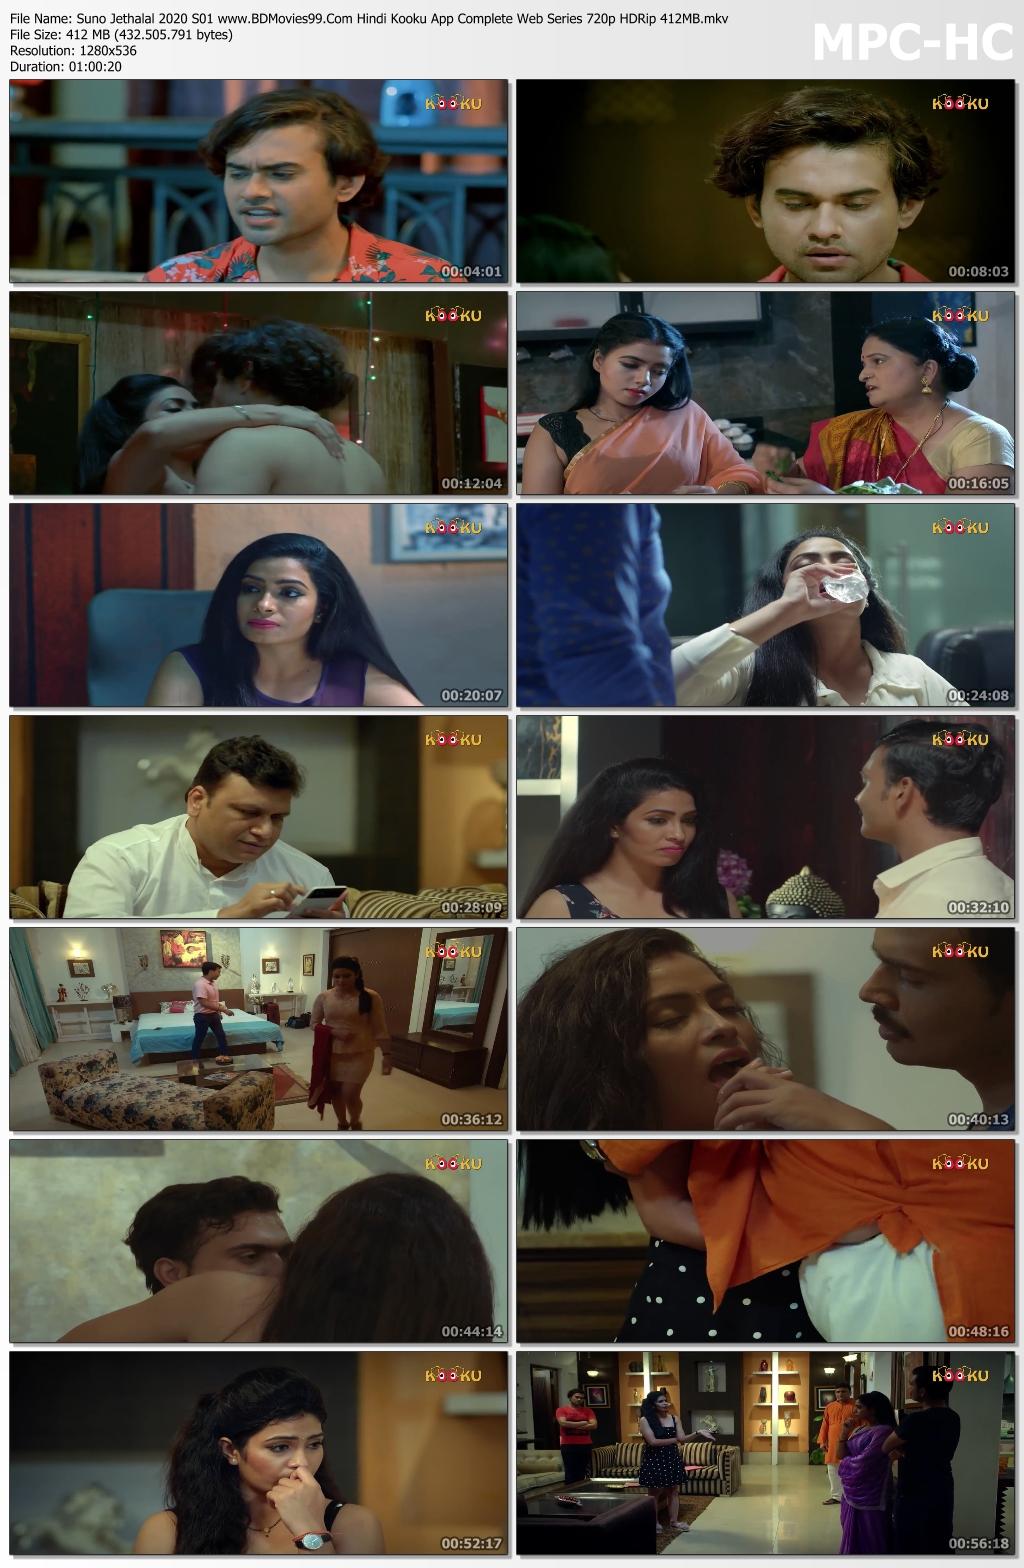 Suno-Jethalal-2020-S01-www-BDMovies99-Com-Hindi-Kooku-App-Complete-Web-Series-720p-HDRip-412-MB-mkv-